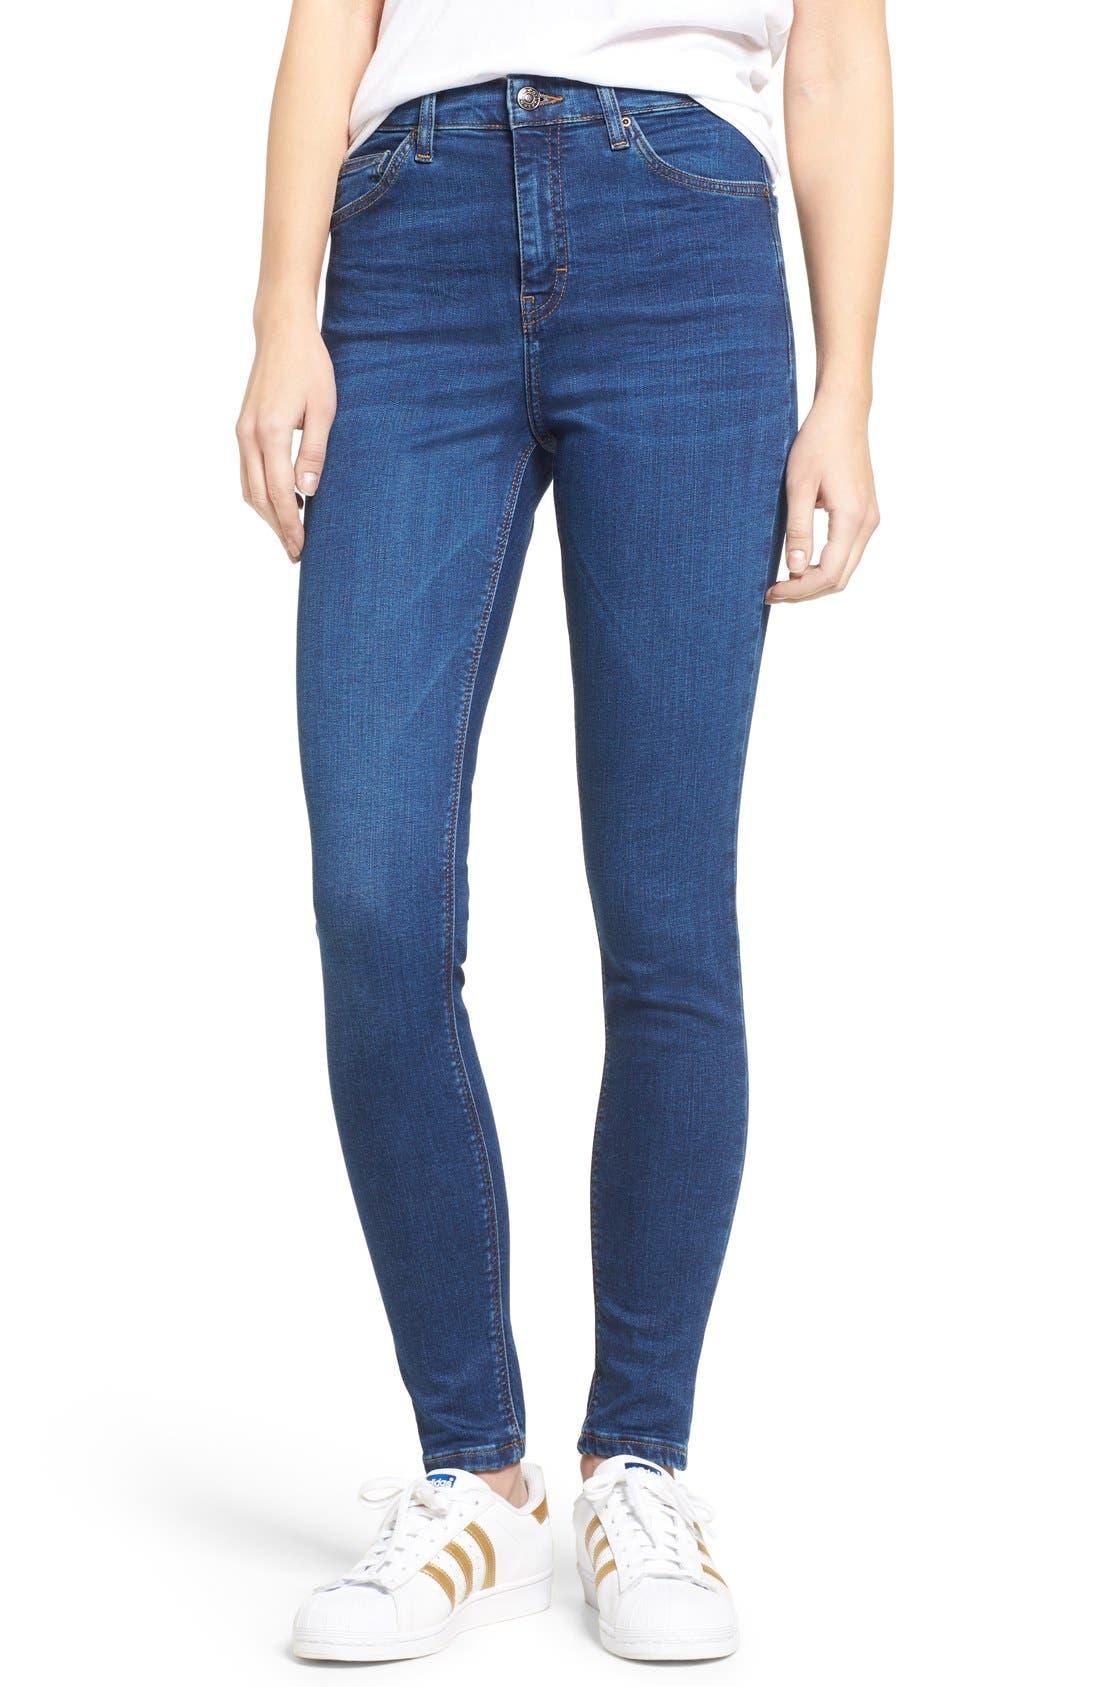 Topshop Jamie High Waist Ankle Skinny Jeans | Nordstrom